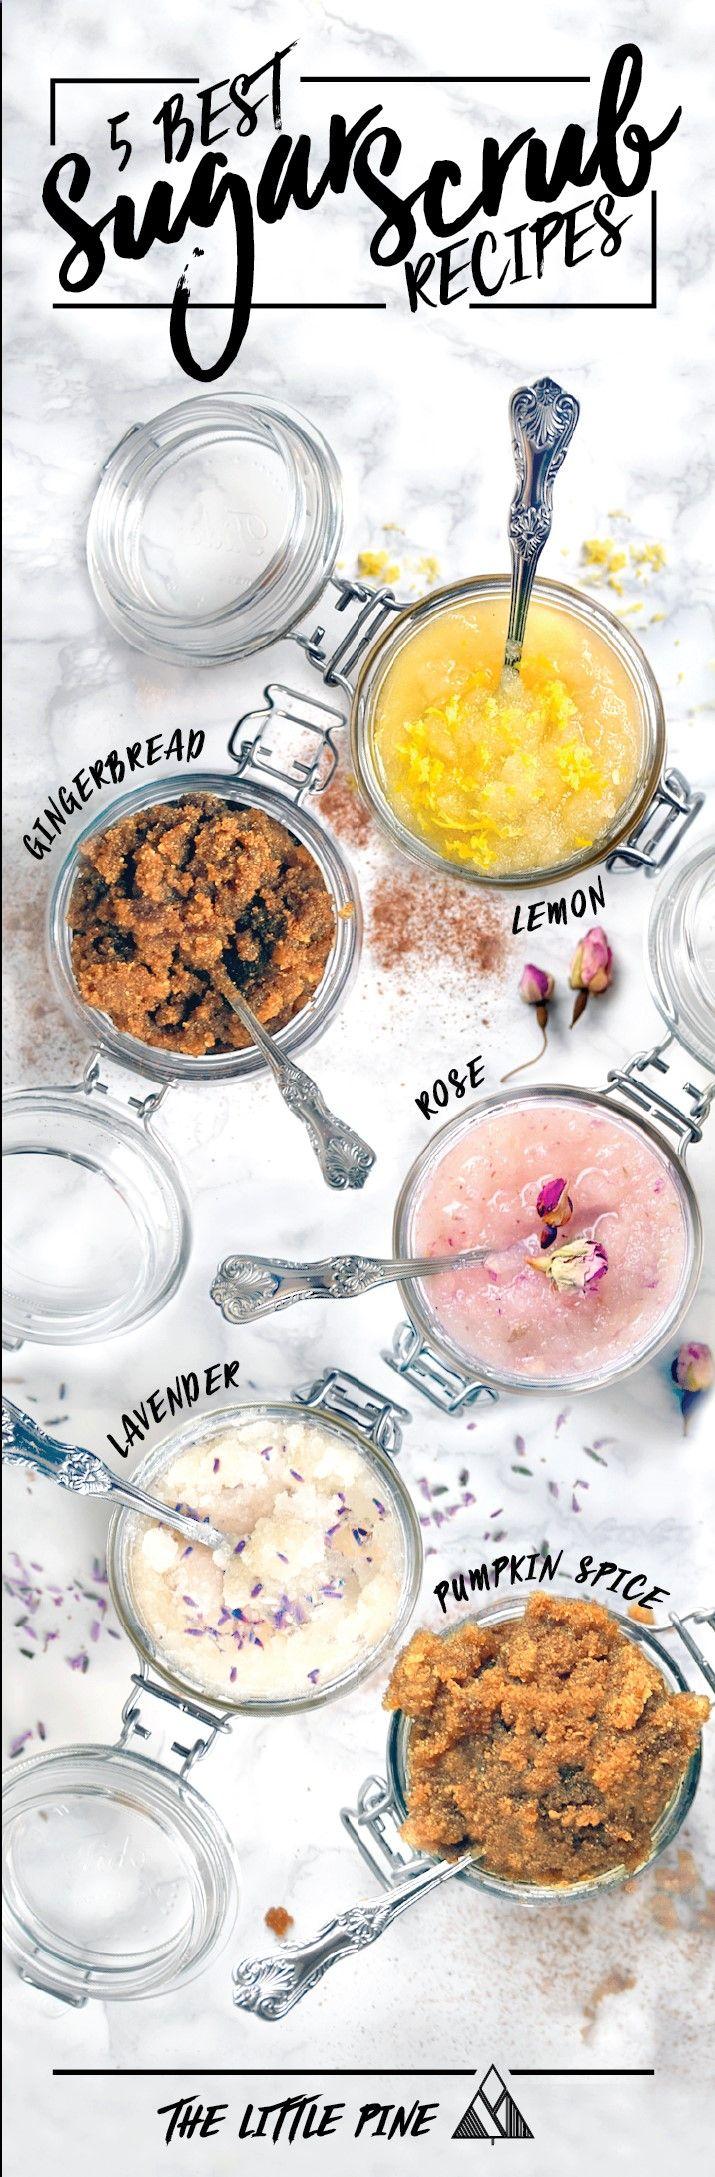 Homemade Sugar Scrub Recipe | The Little Pine